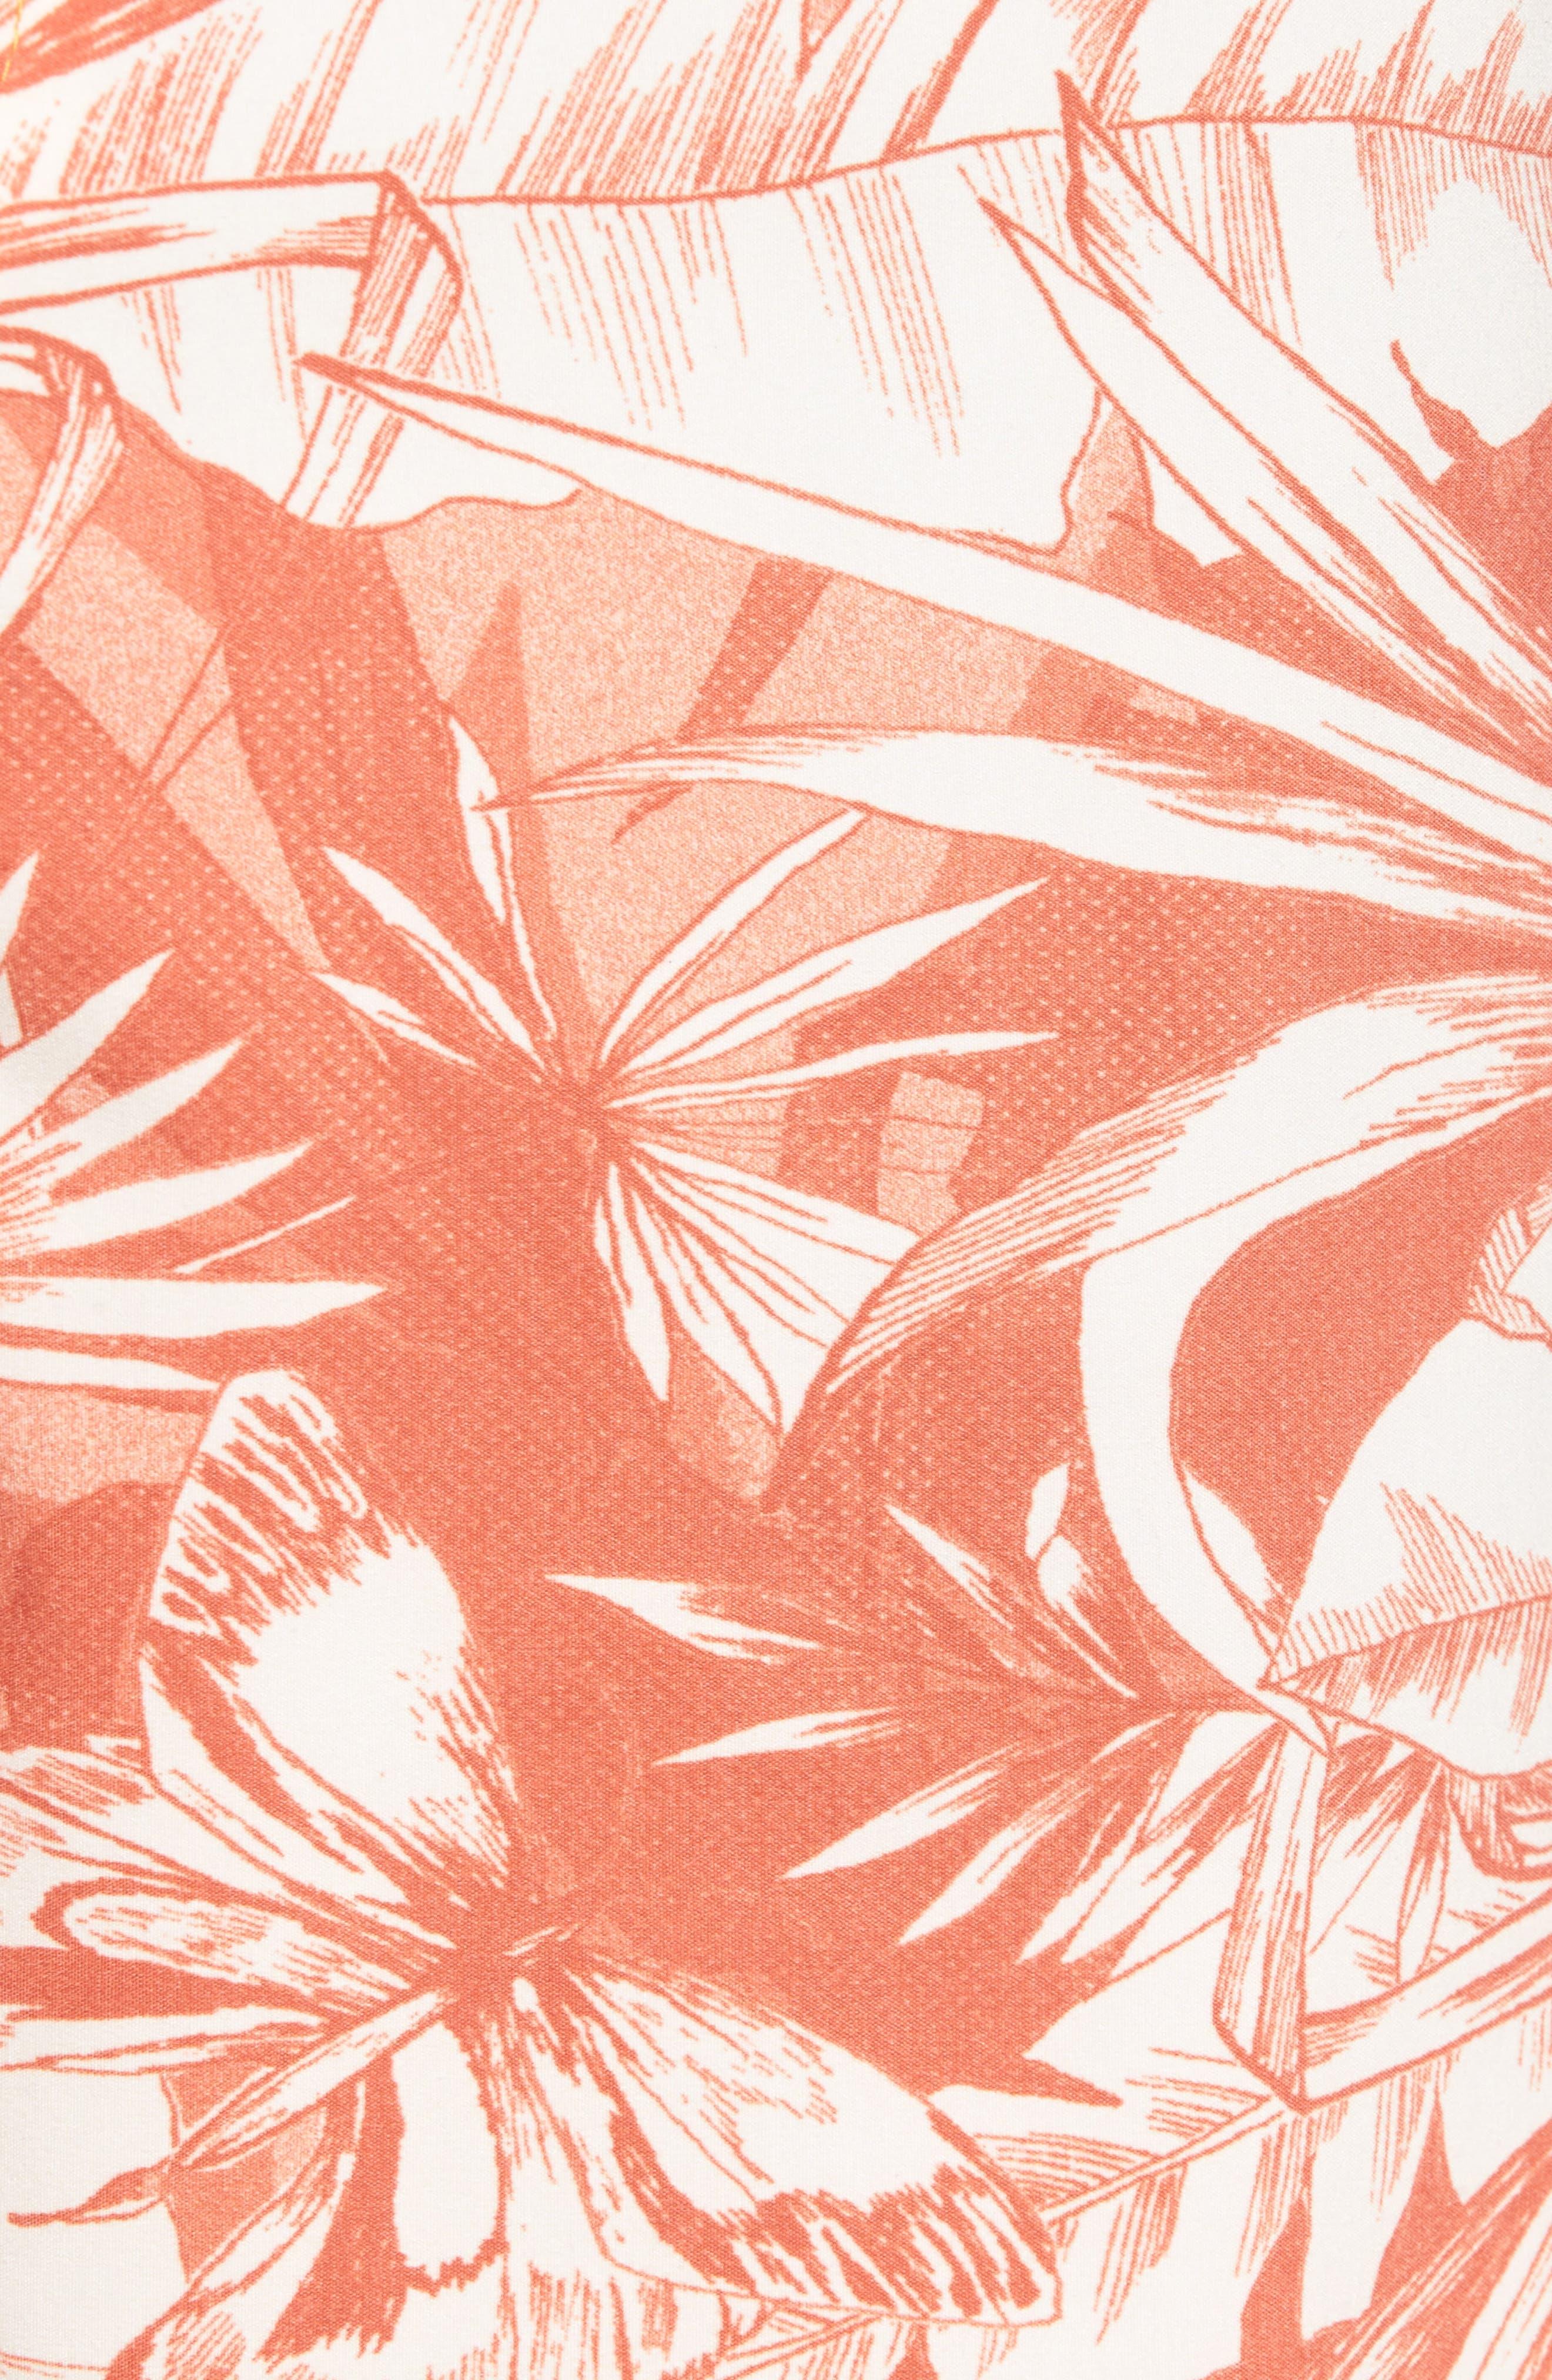 Sunset Board Shorts,                             Alternate thumbnail 5, color,                             214